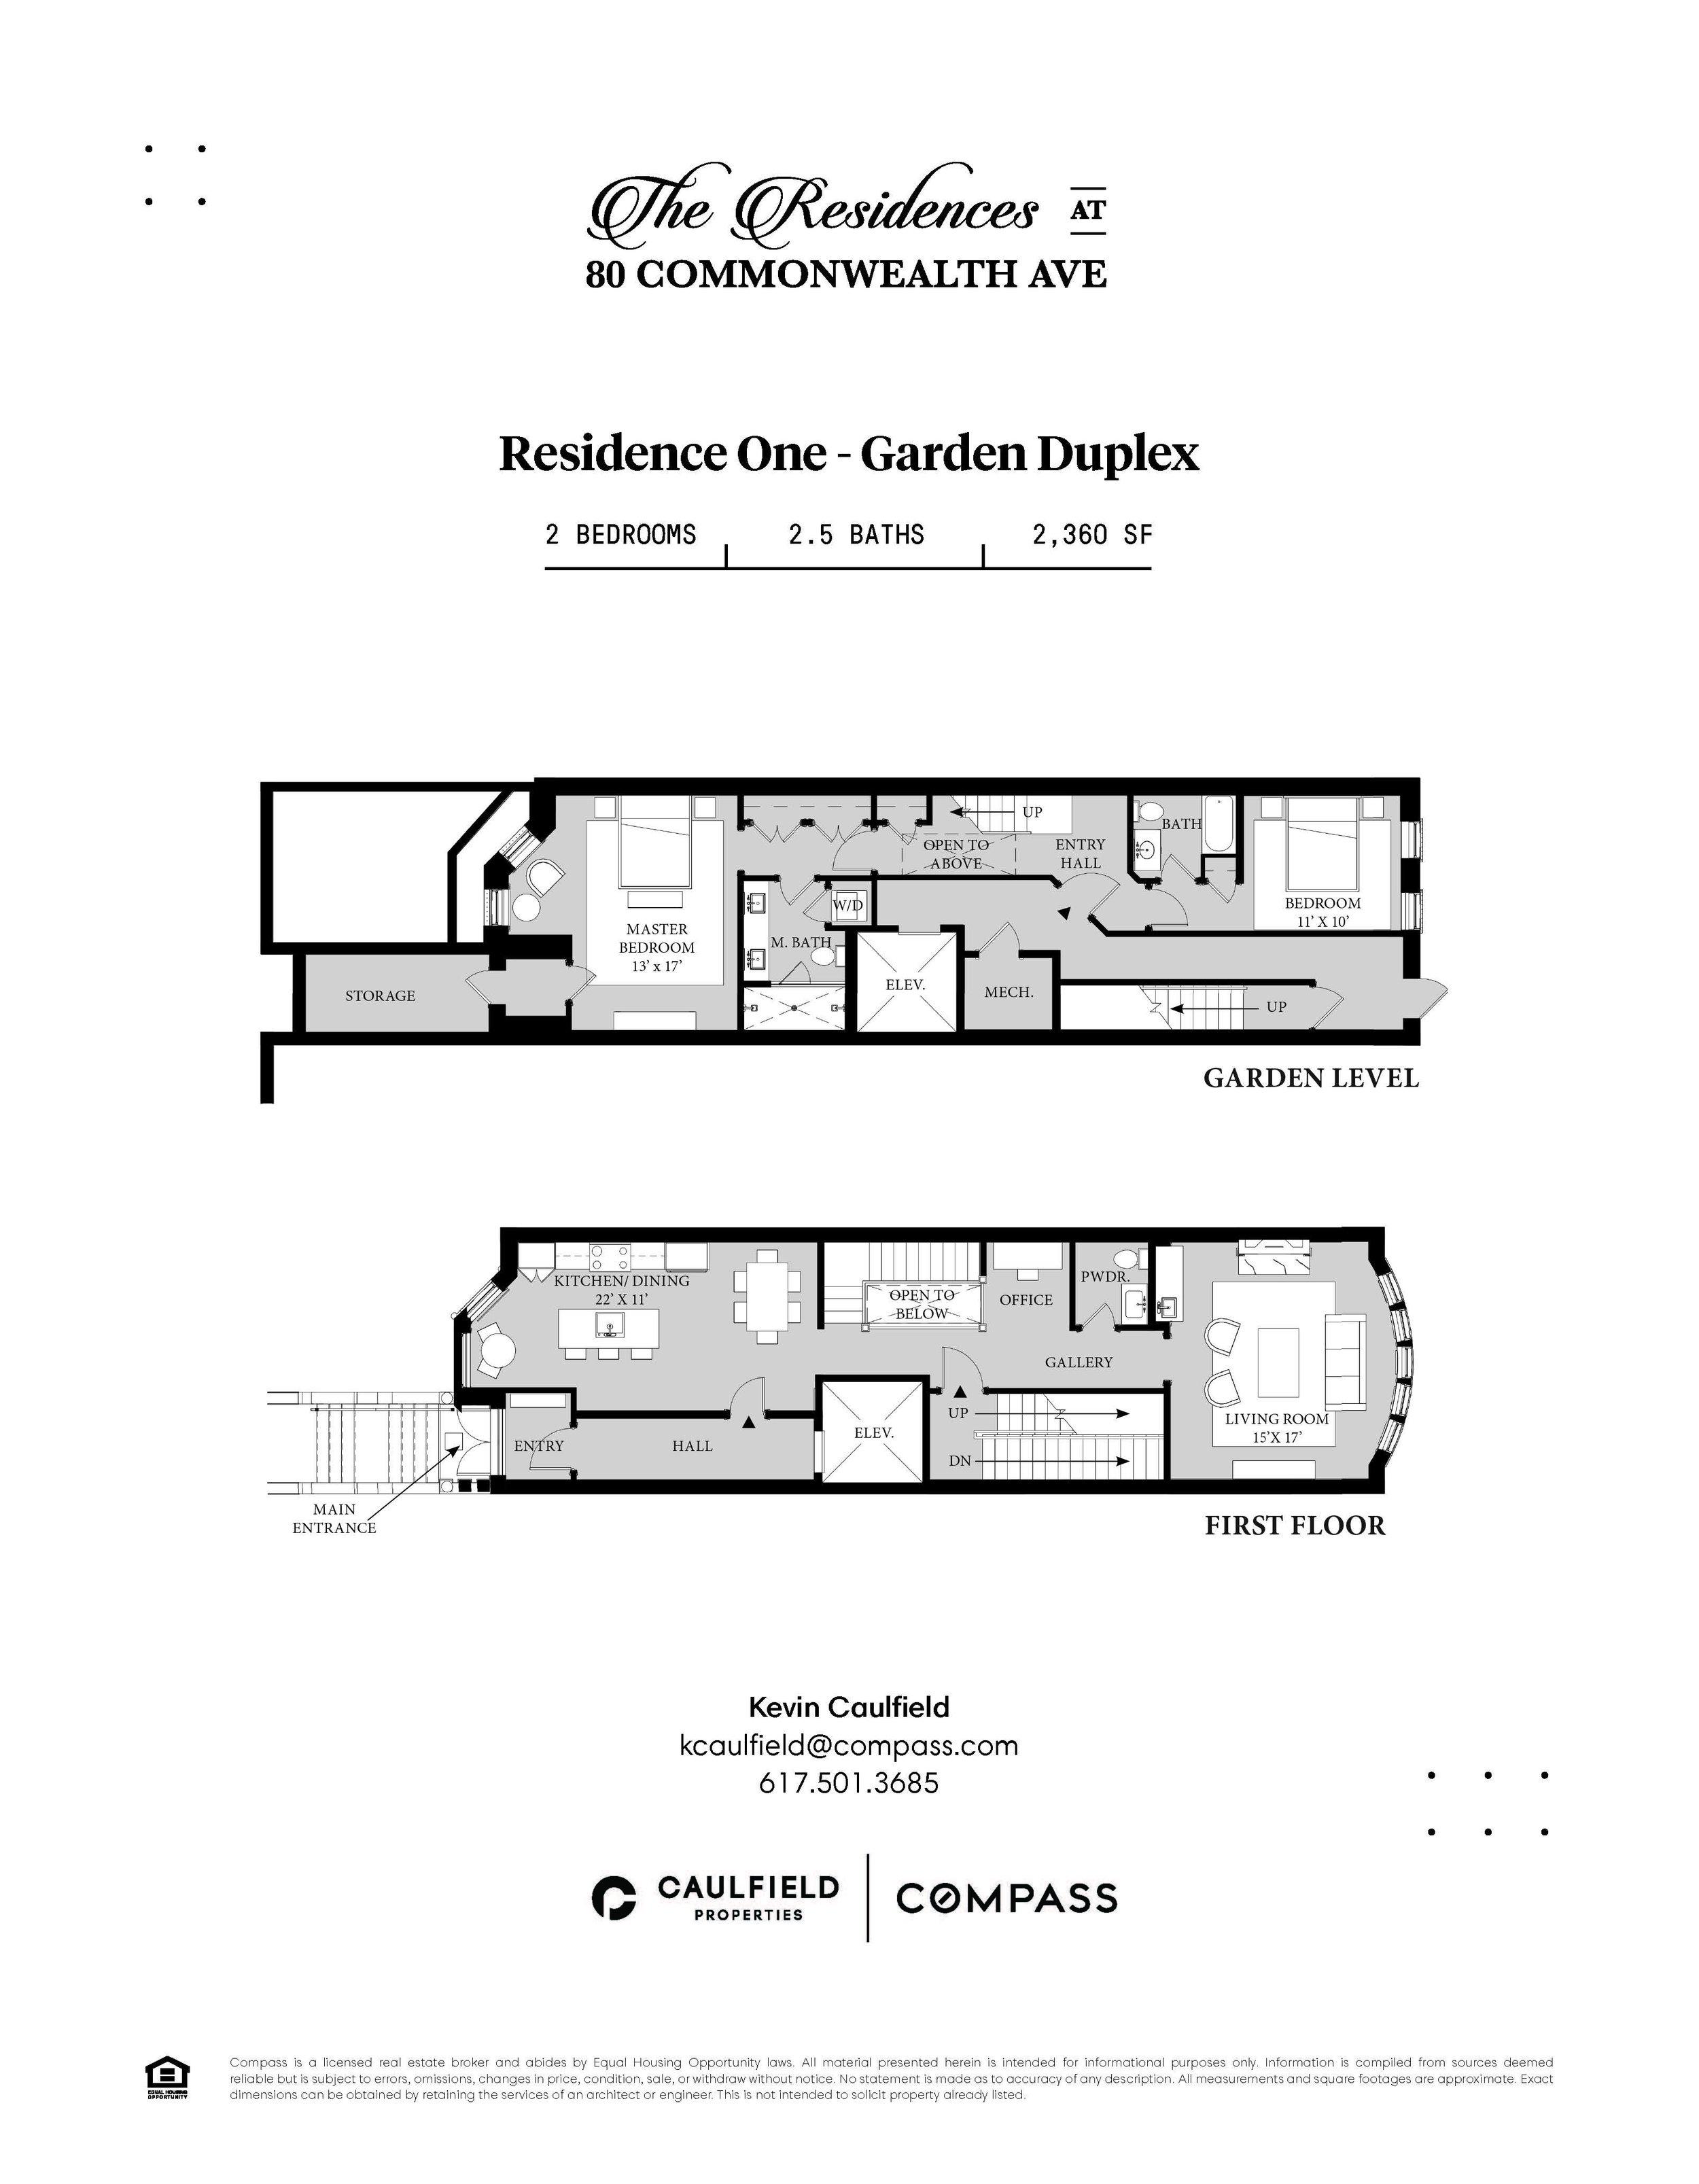 Caulfield Properties--80 Comm Ave Floor Plan Inserts_Final_01.jpg